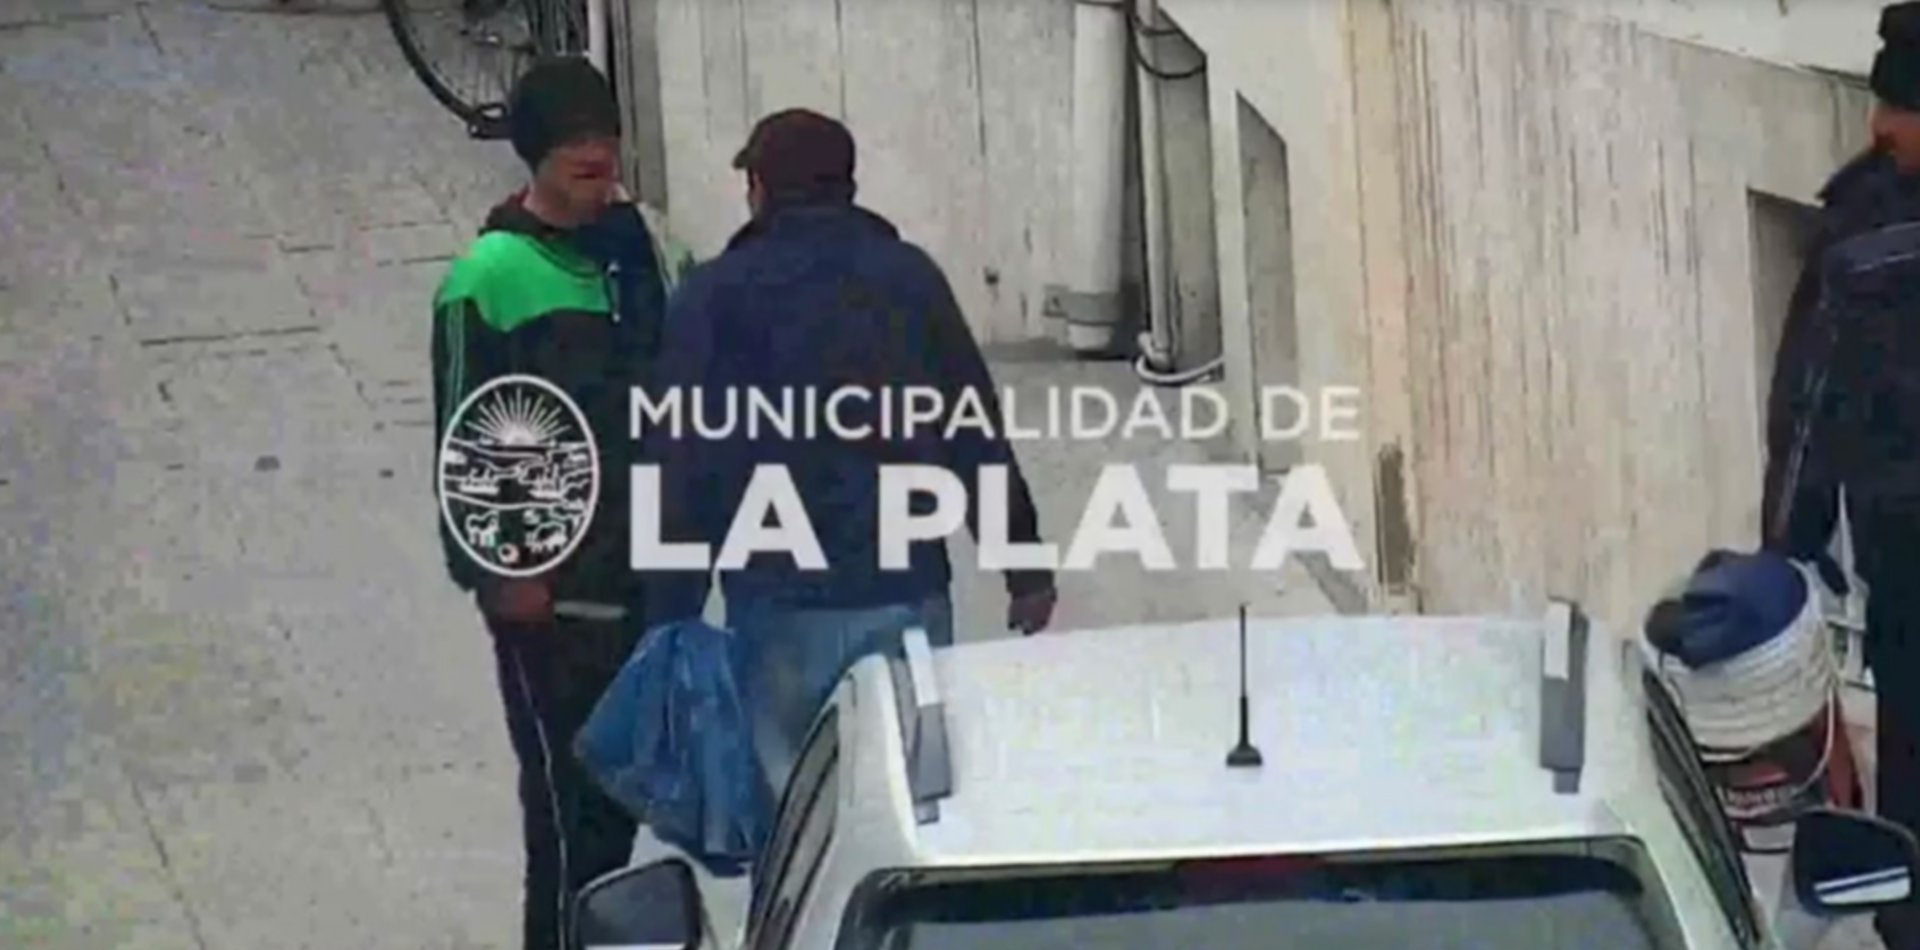 VIDEO: Un grupo de trapitos se peleó con cuchillos a metros del ministerio de Seguridad